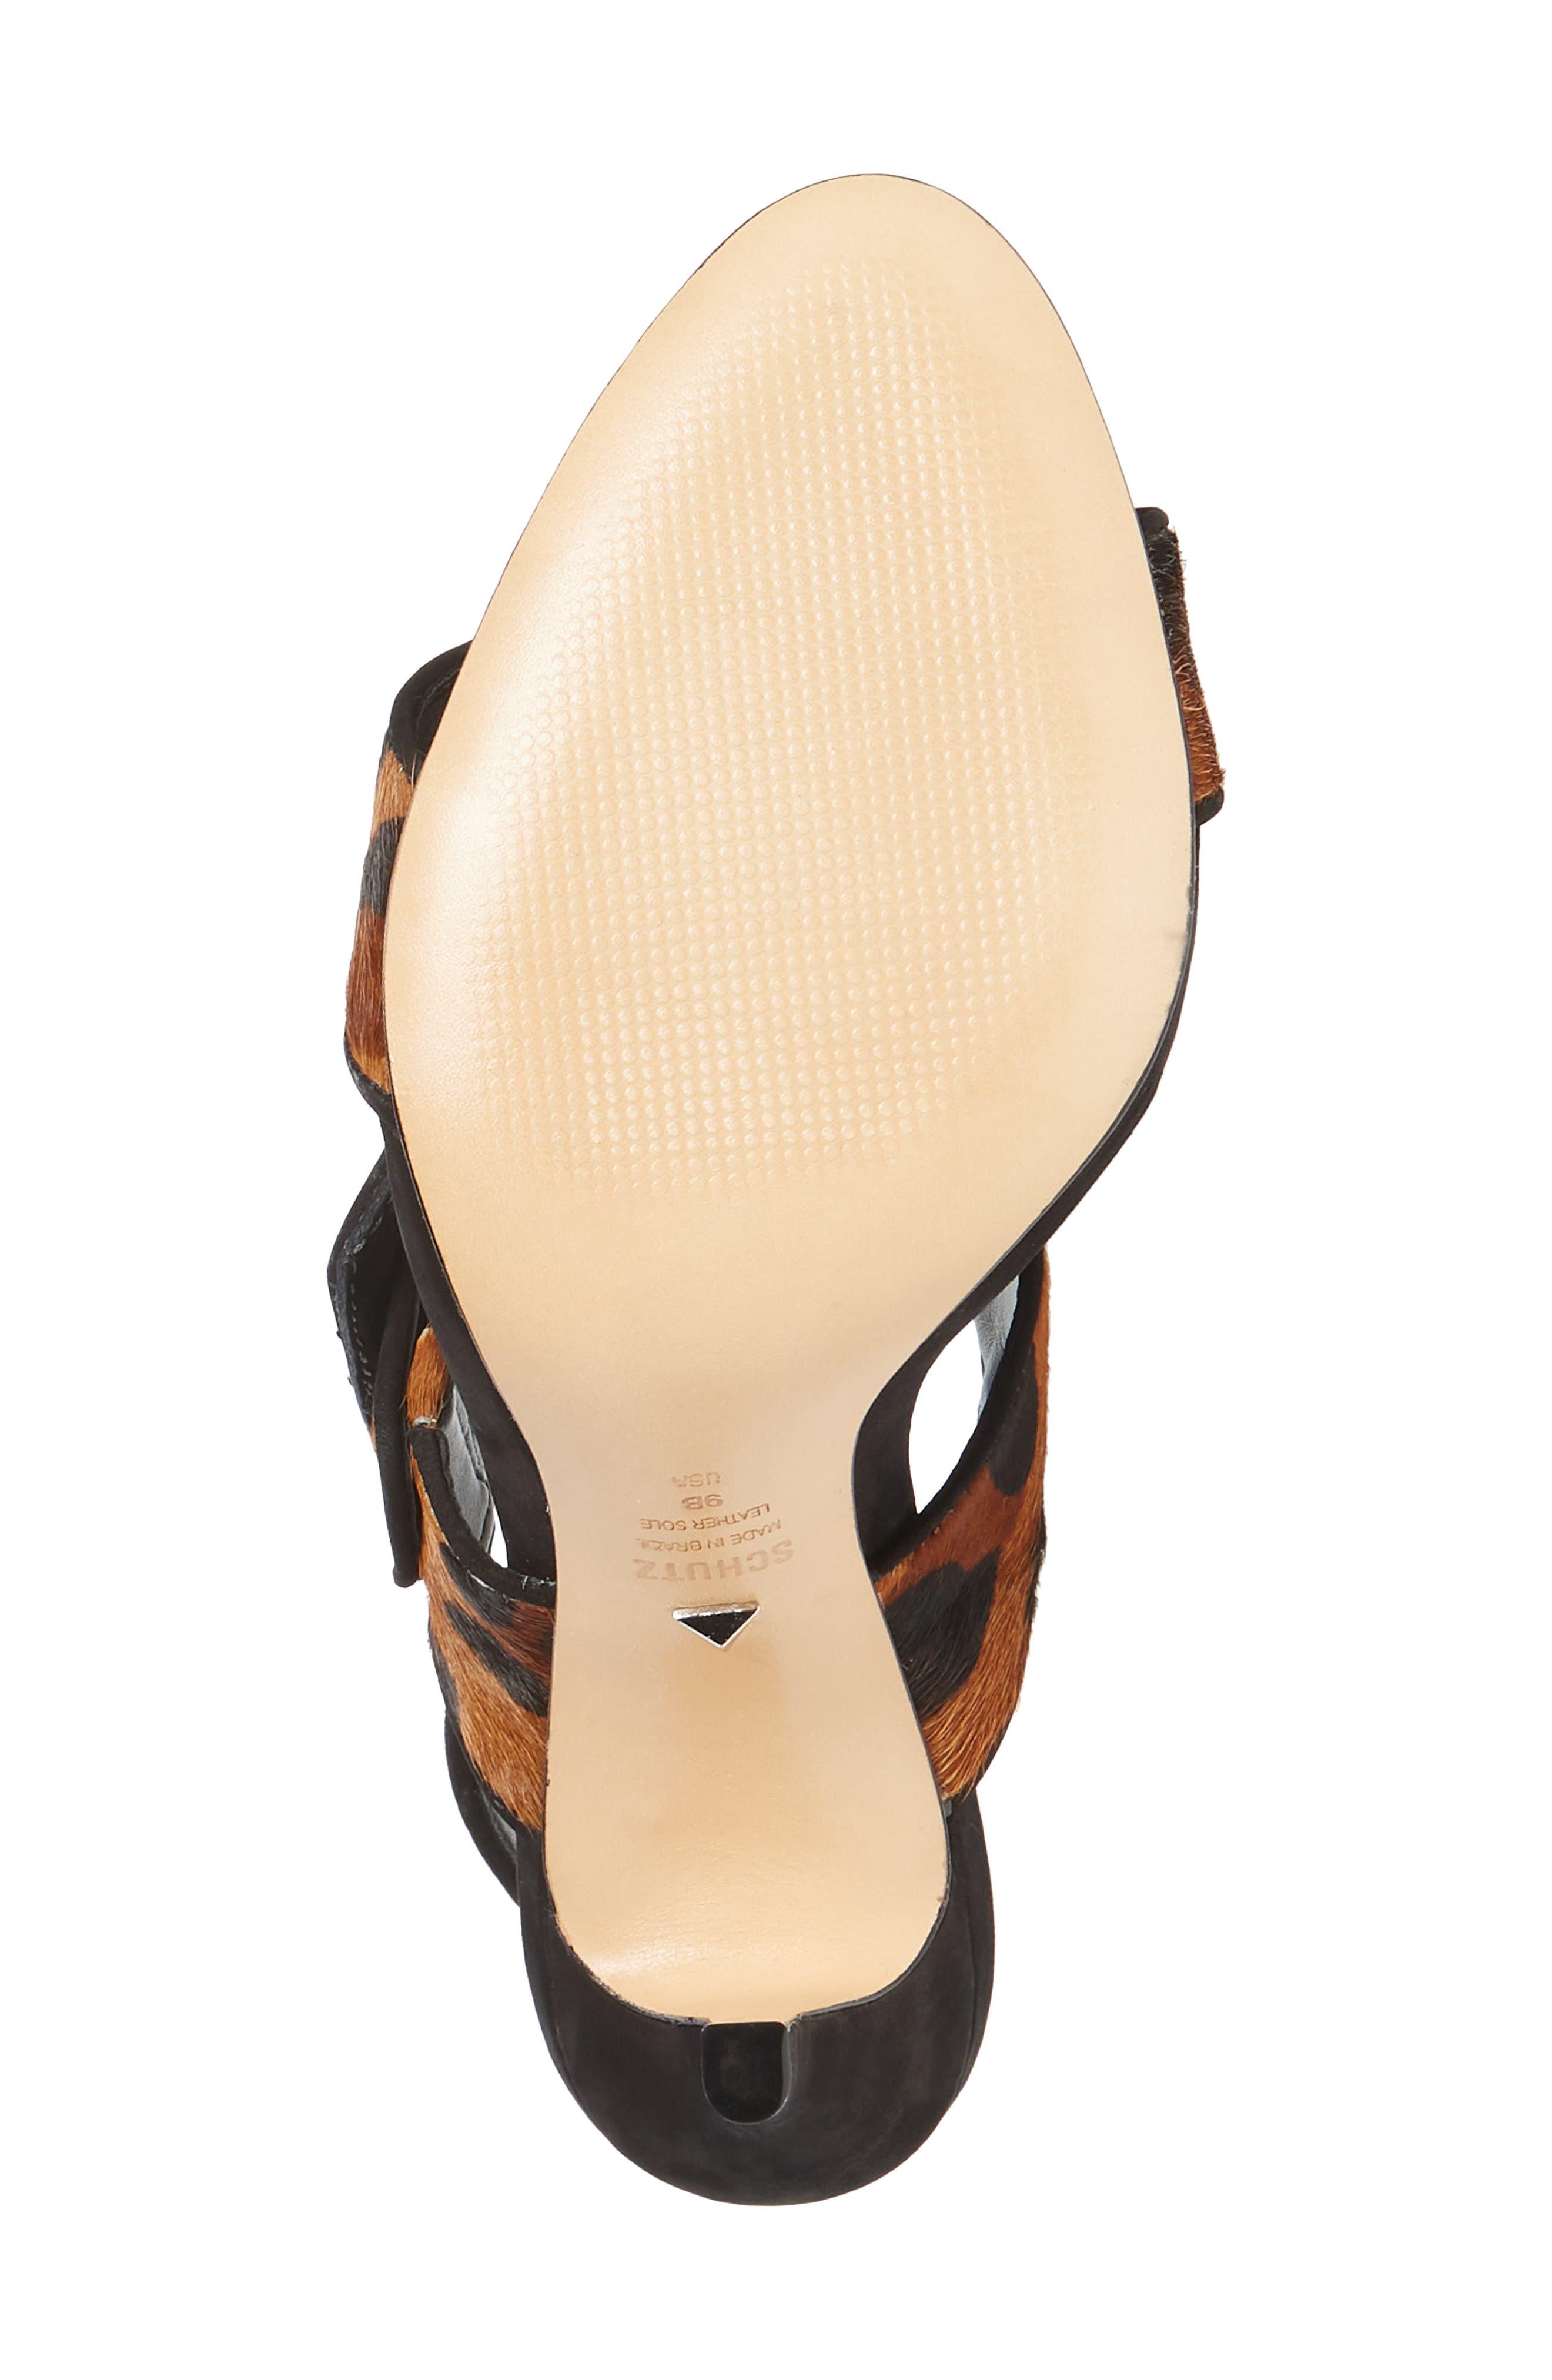 Lucci Genuine Calf Hair Sandal,                             Alternate thumbnail 6, color,                             NATURAL/ BLACK